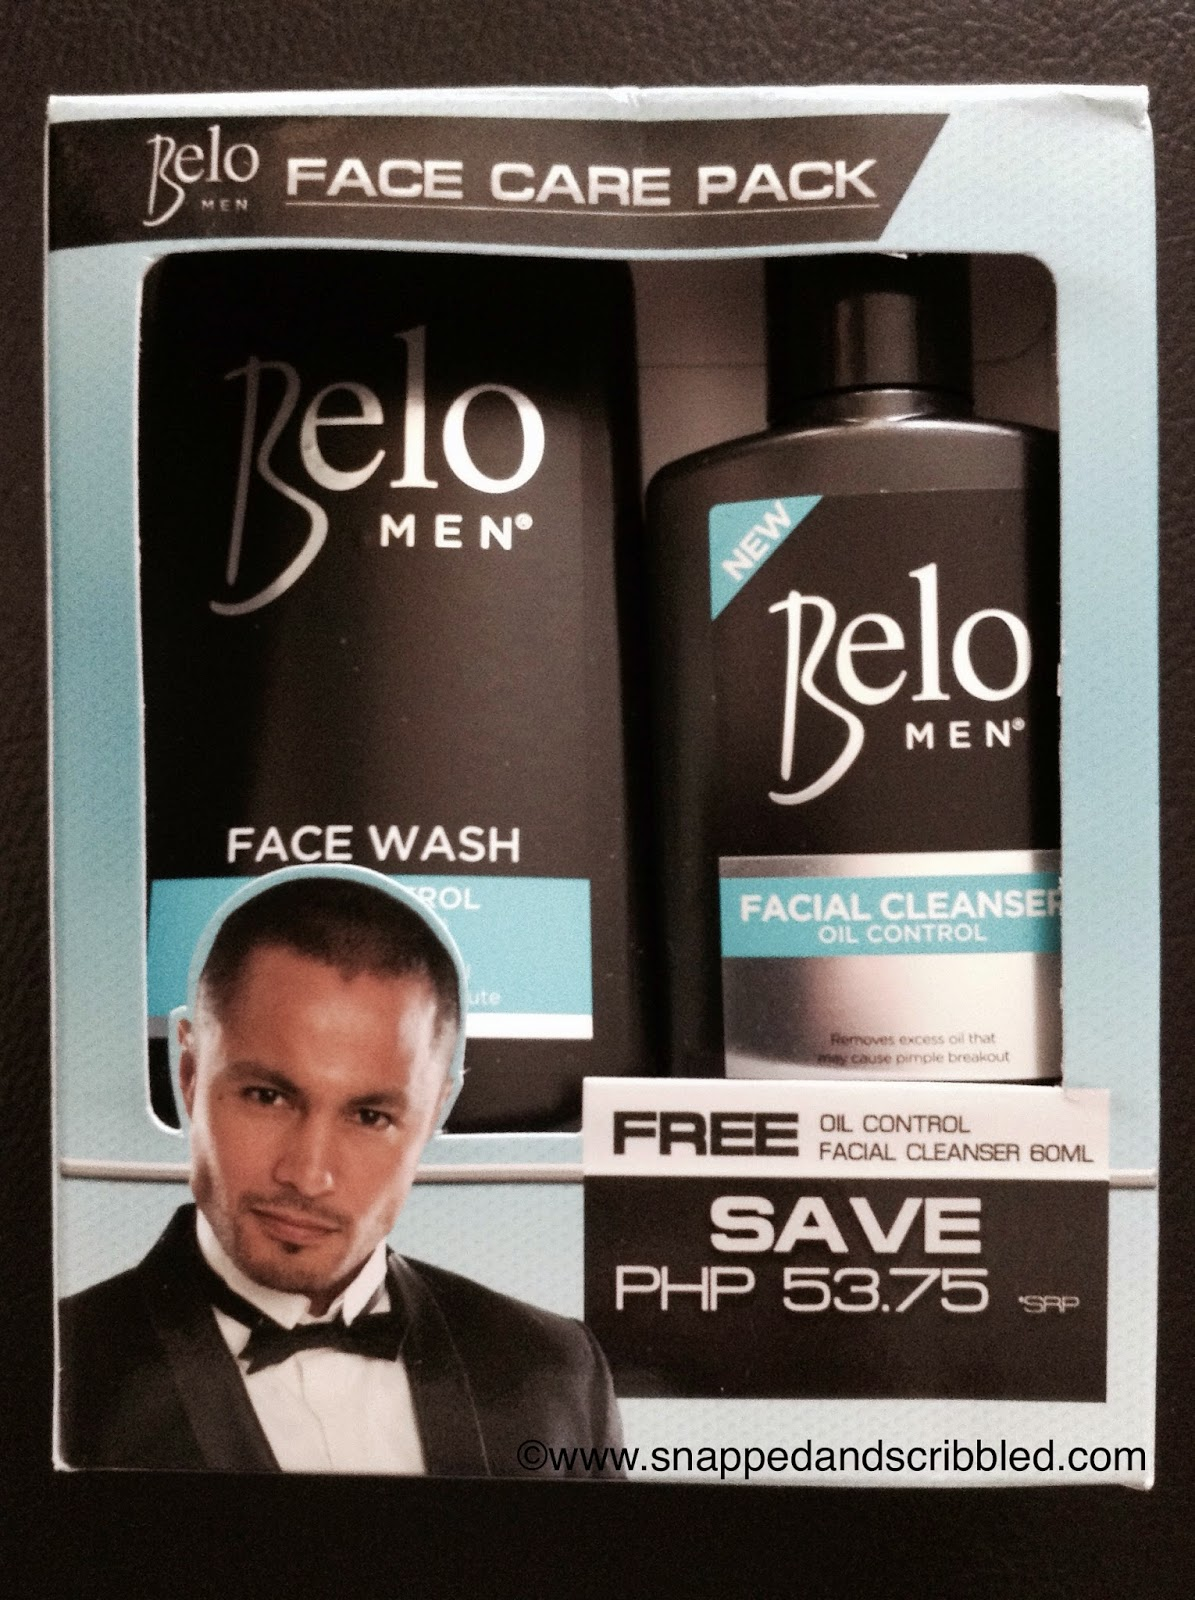 Christmas Gift for Him: Belo Men Face Care Pack